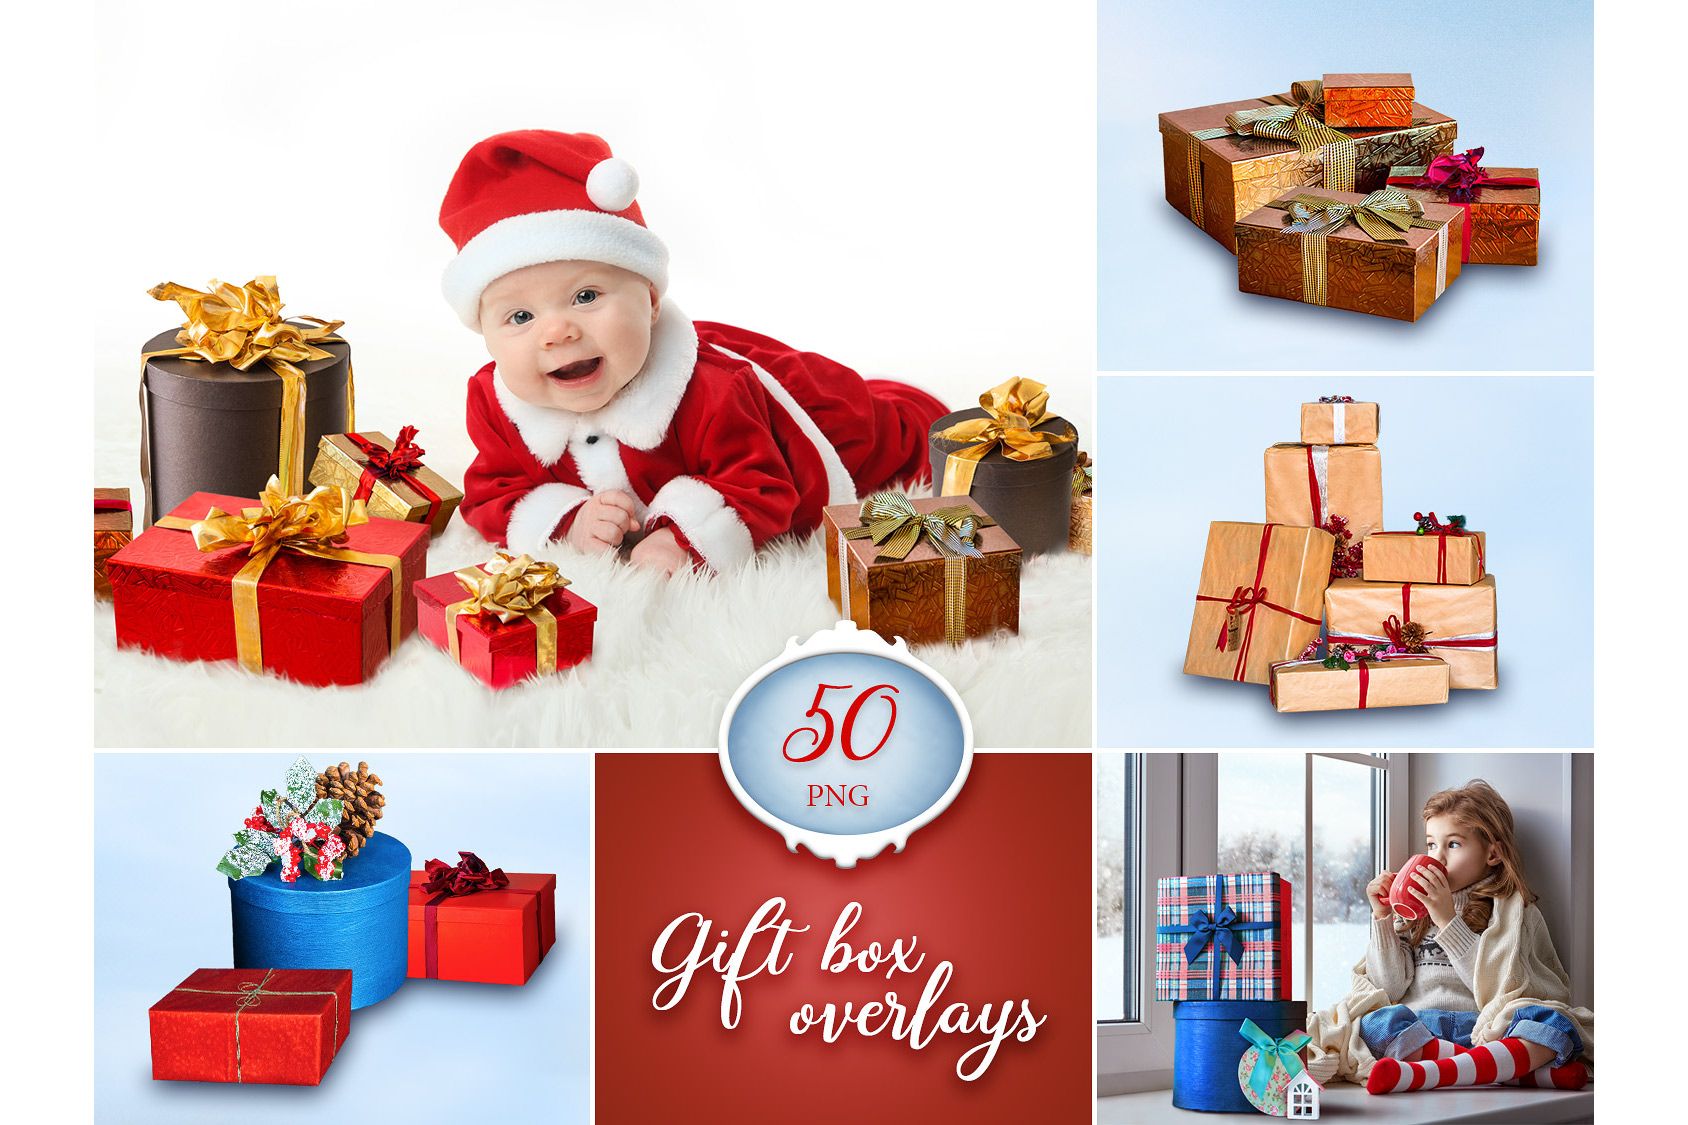 50 Gift Box Photo Overlays example image 1